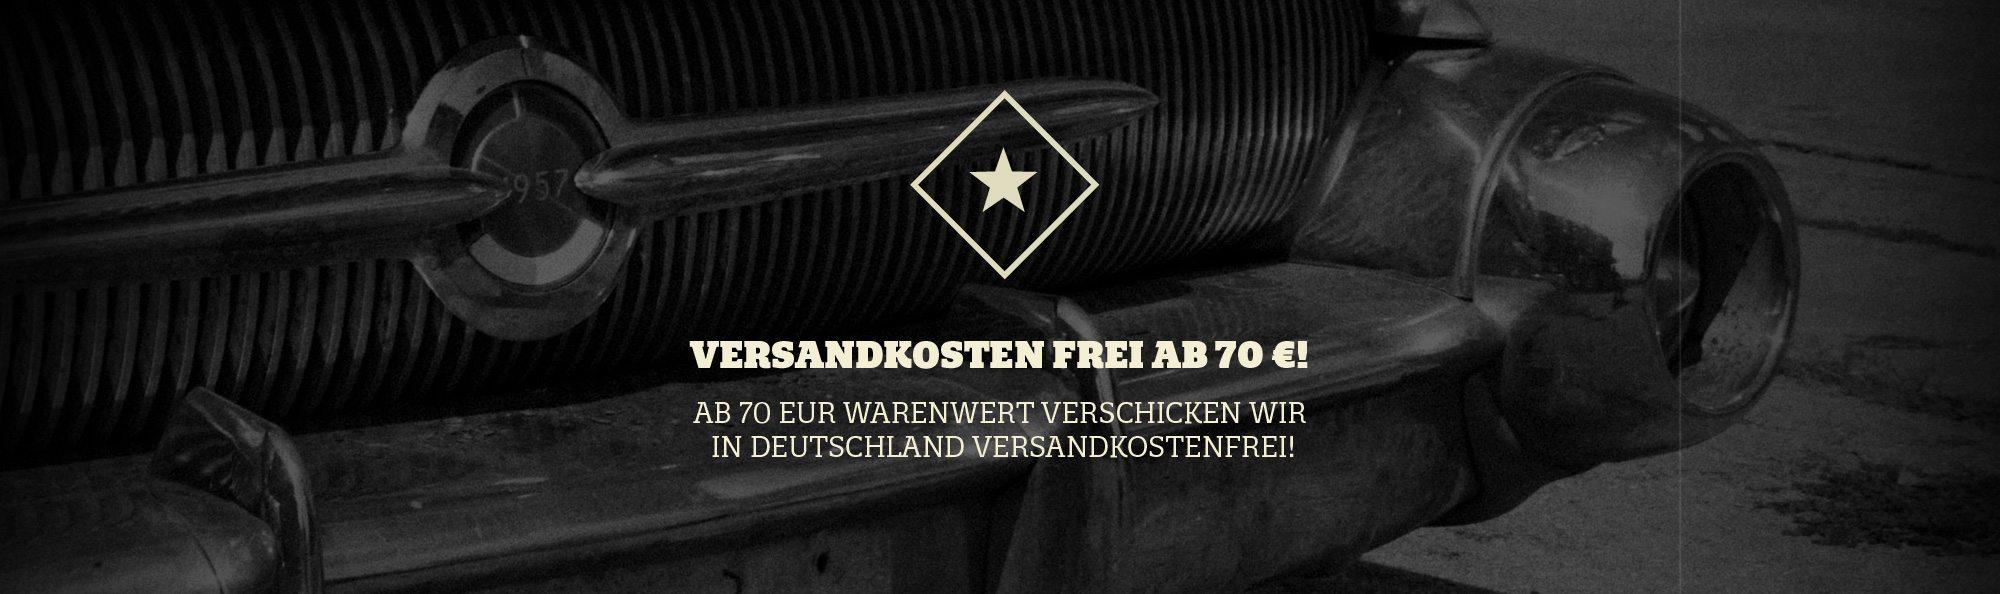 Versandkostenfrei ab 70 Euro | www.ultratrash.com